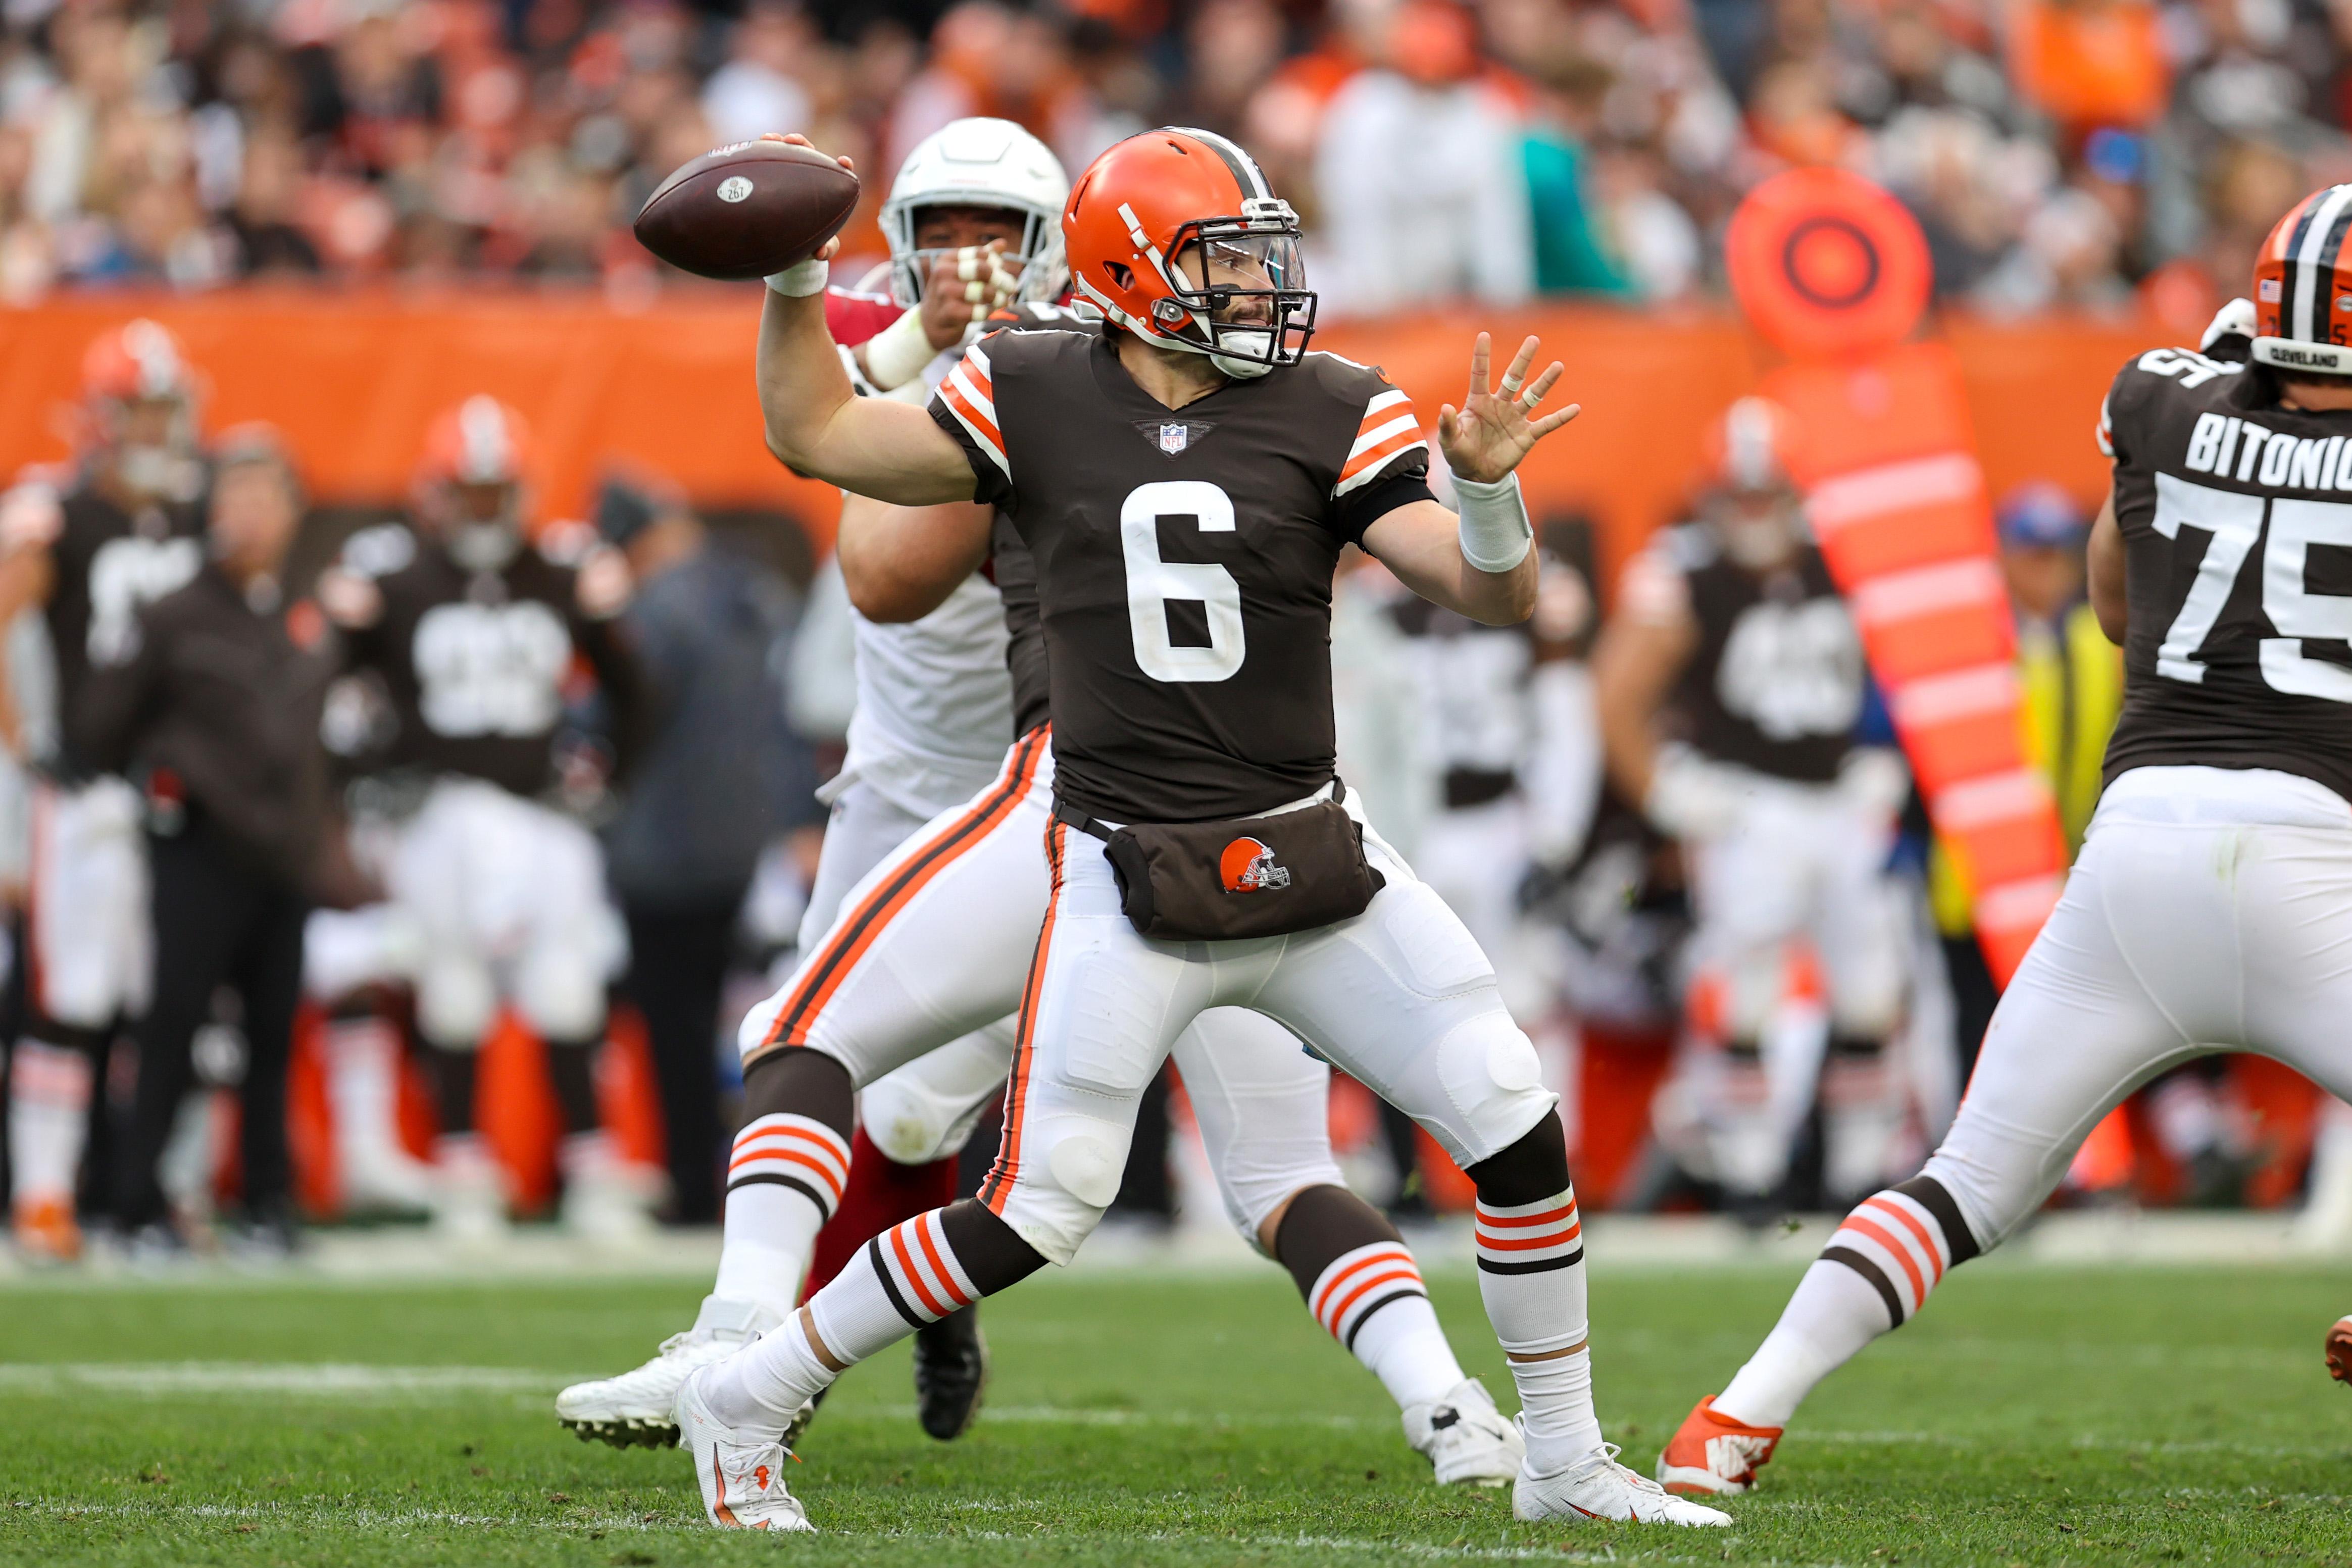 NFL: OCT 17 Cardinals at Browns